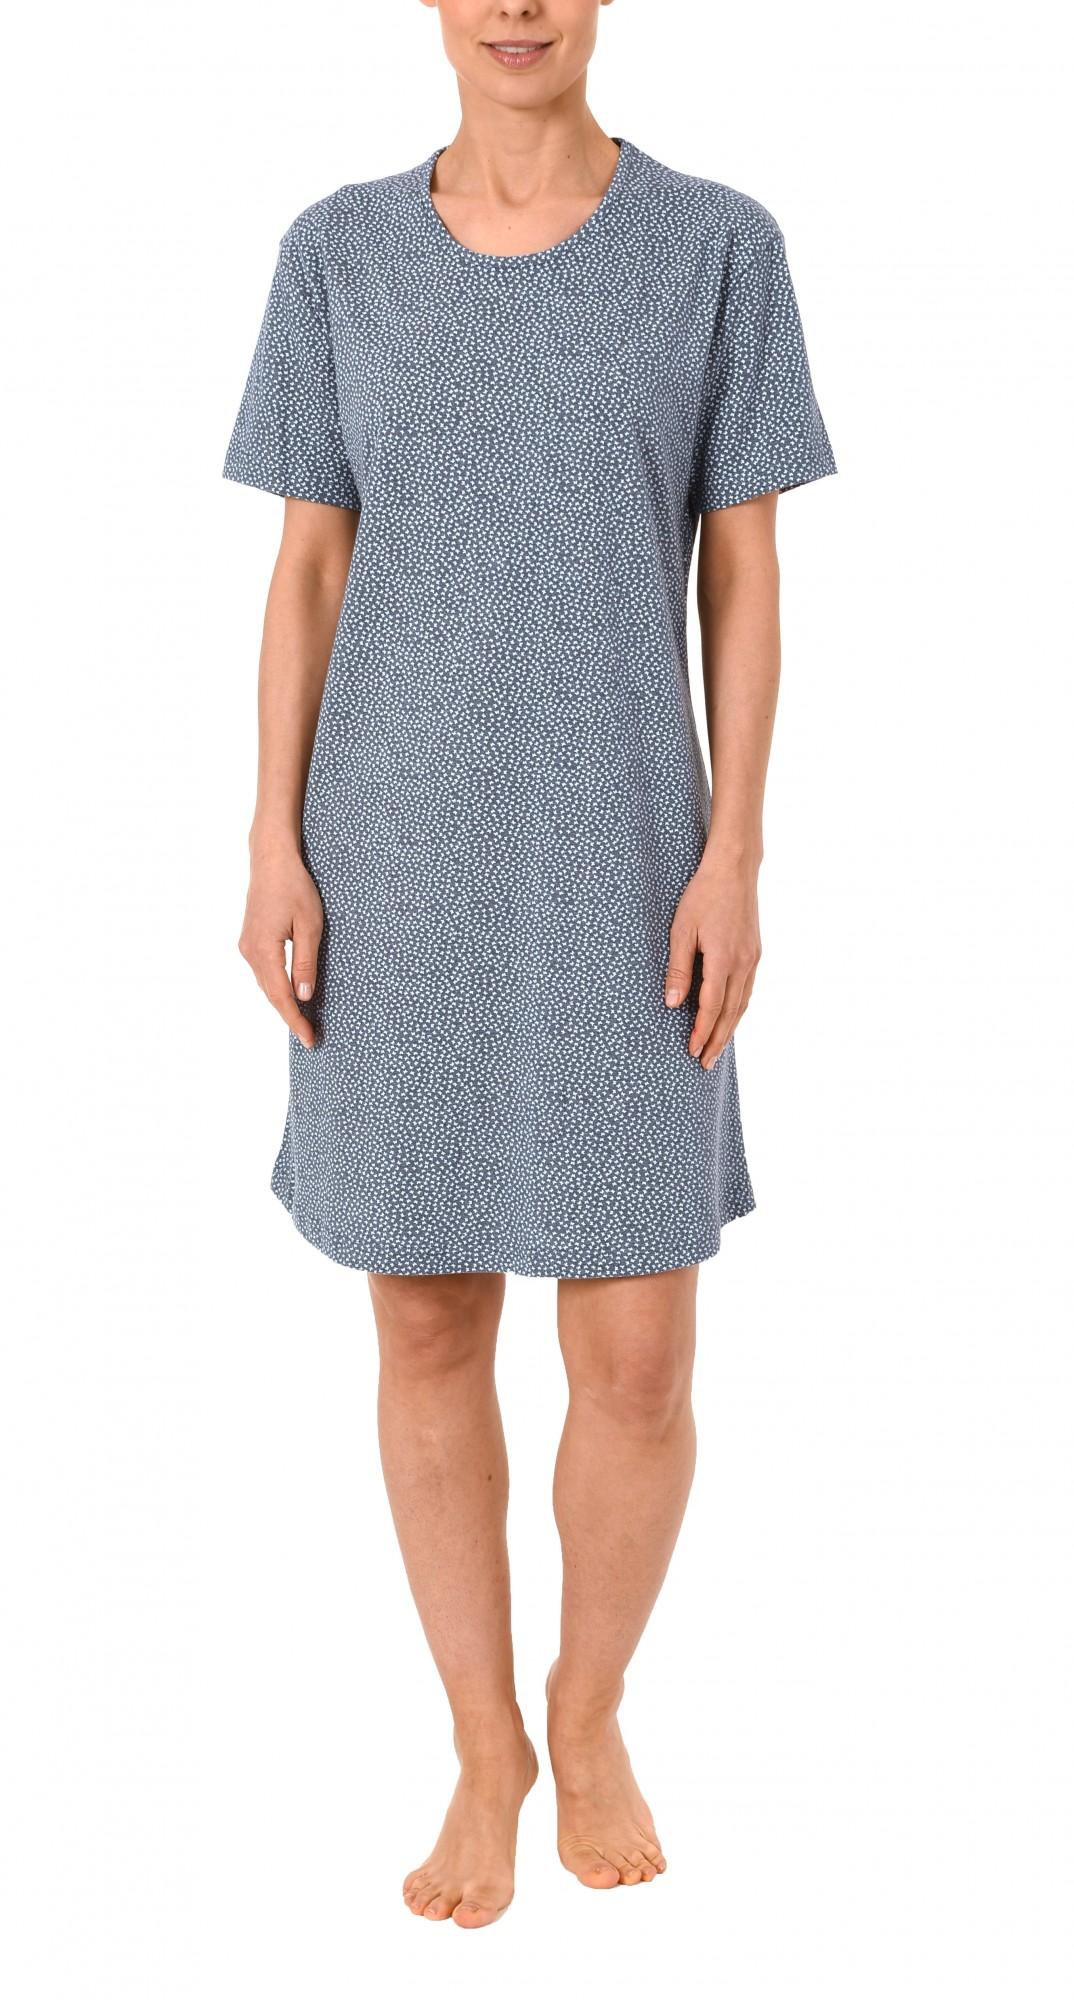 Damen Bigshirt kurzarm Nachthemd mit Minimalprint – 171 213 90 904 – Bild 2